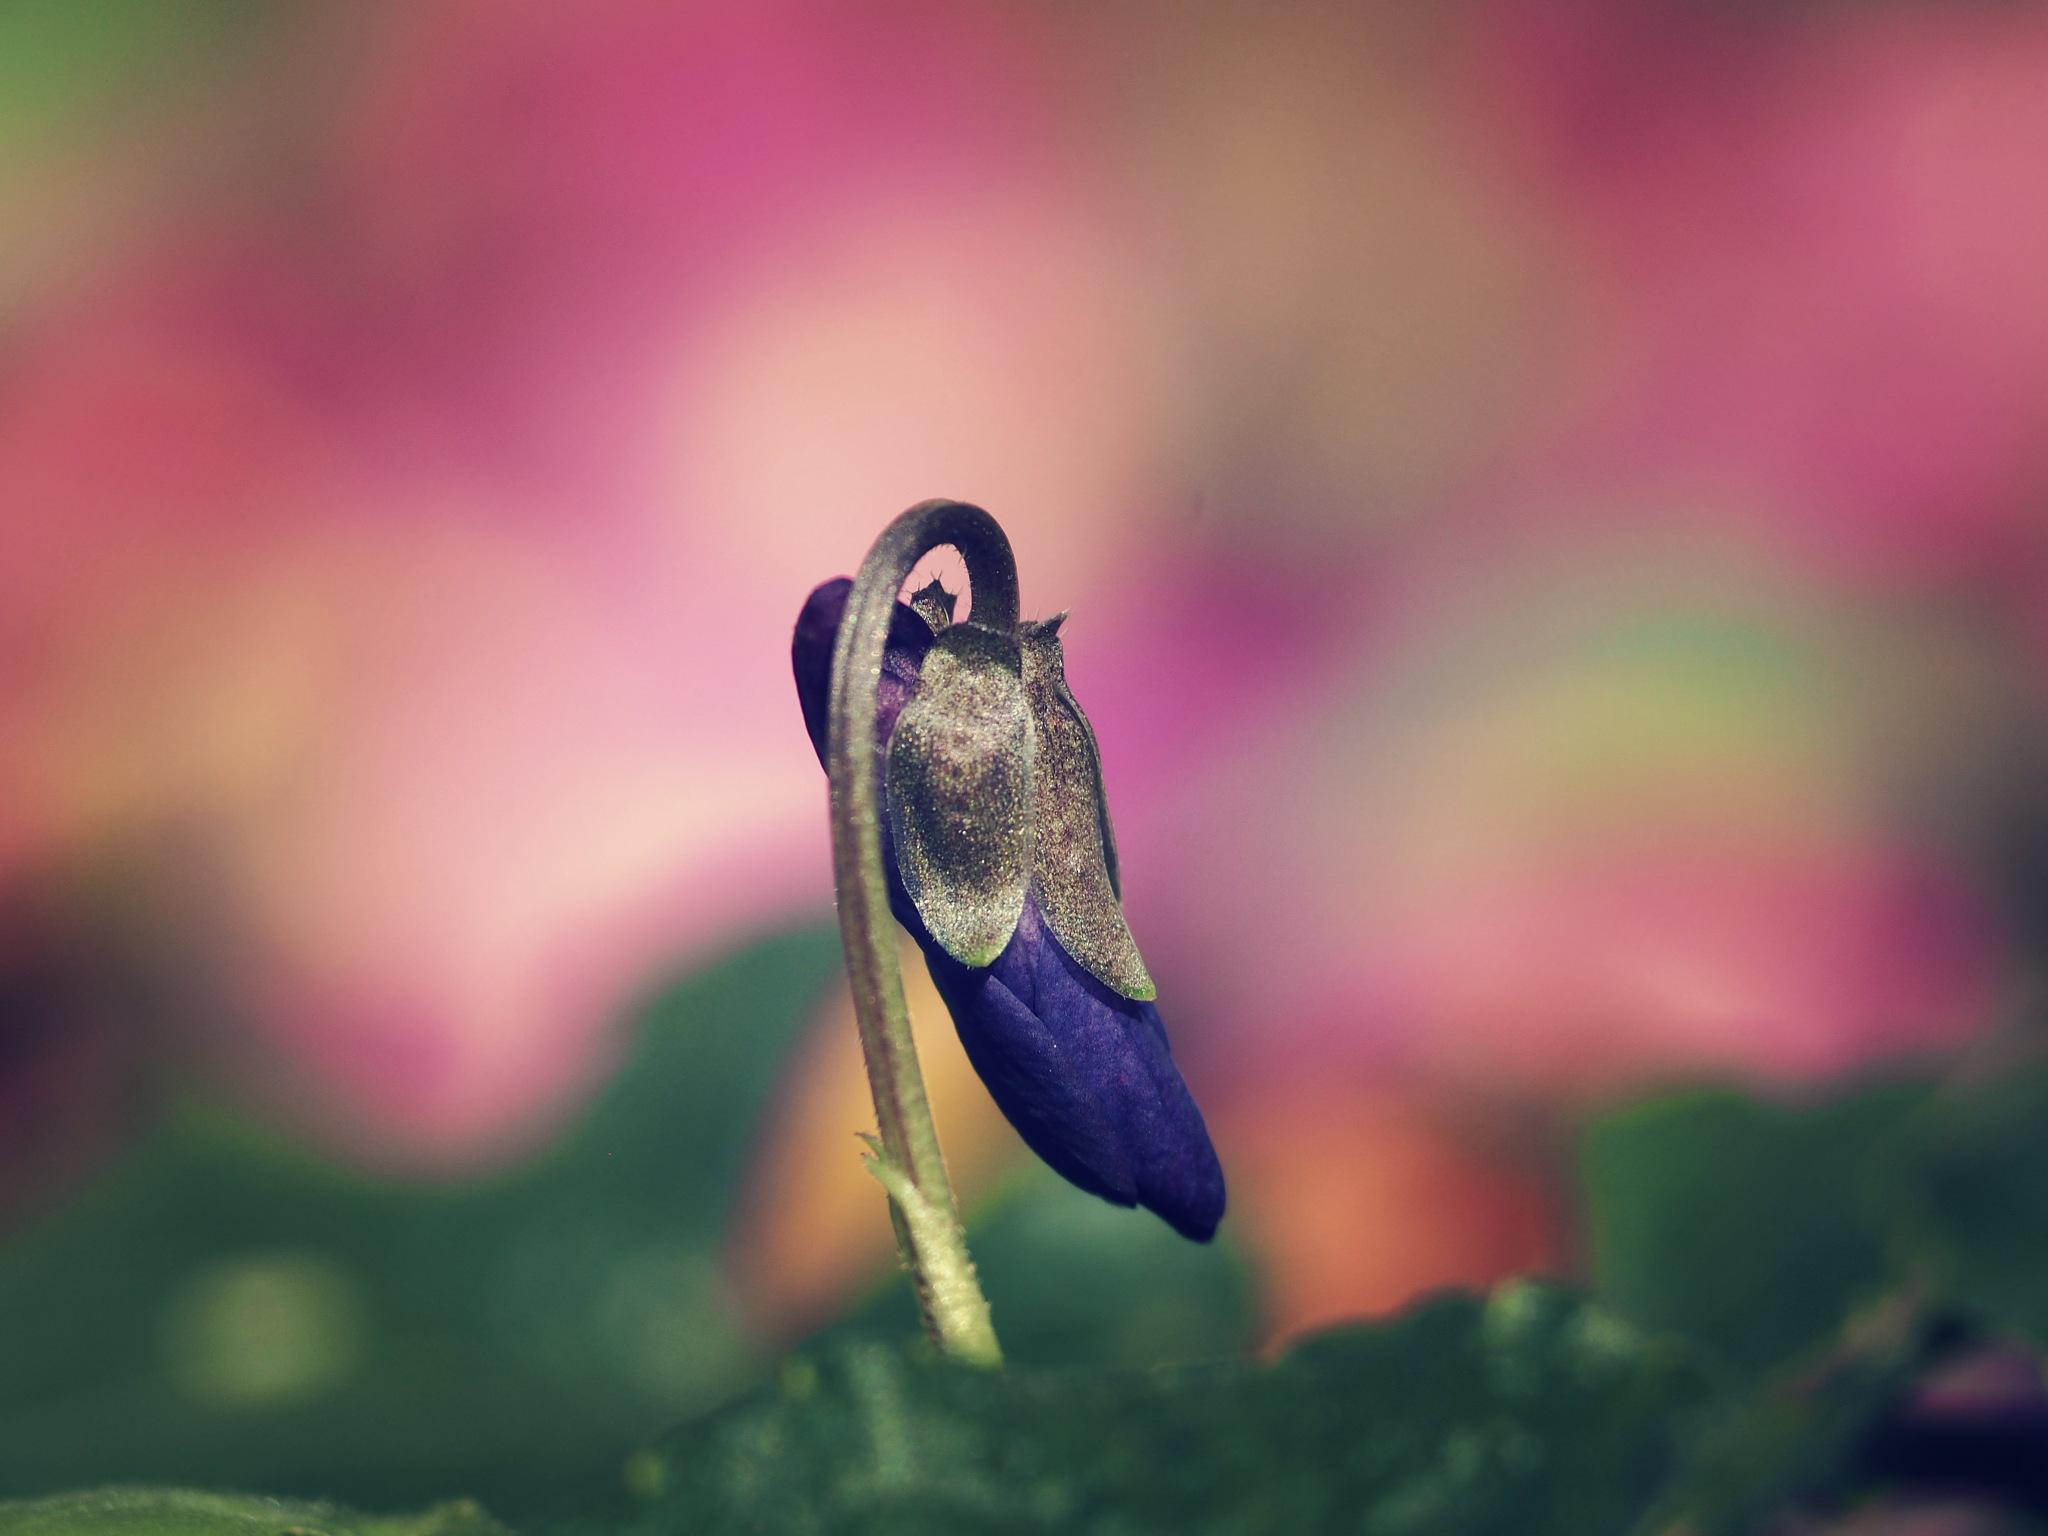 wild flower by alain michel